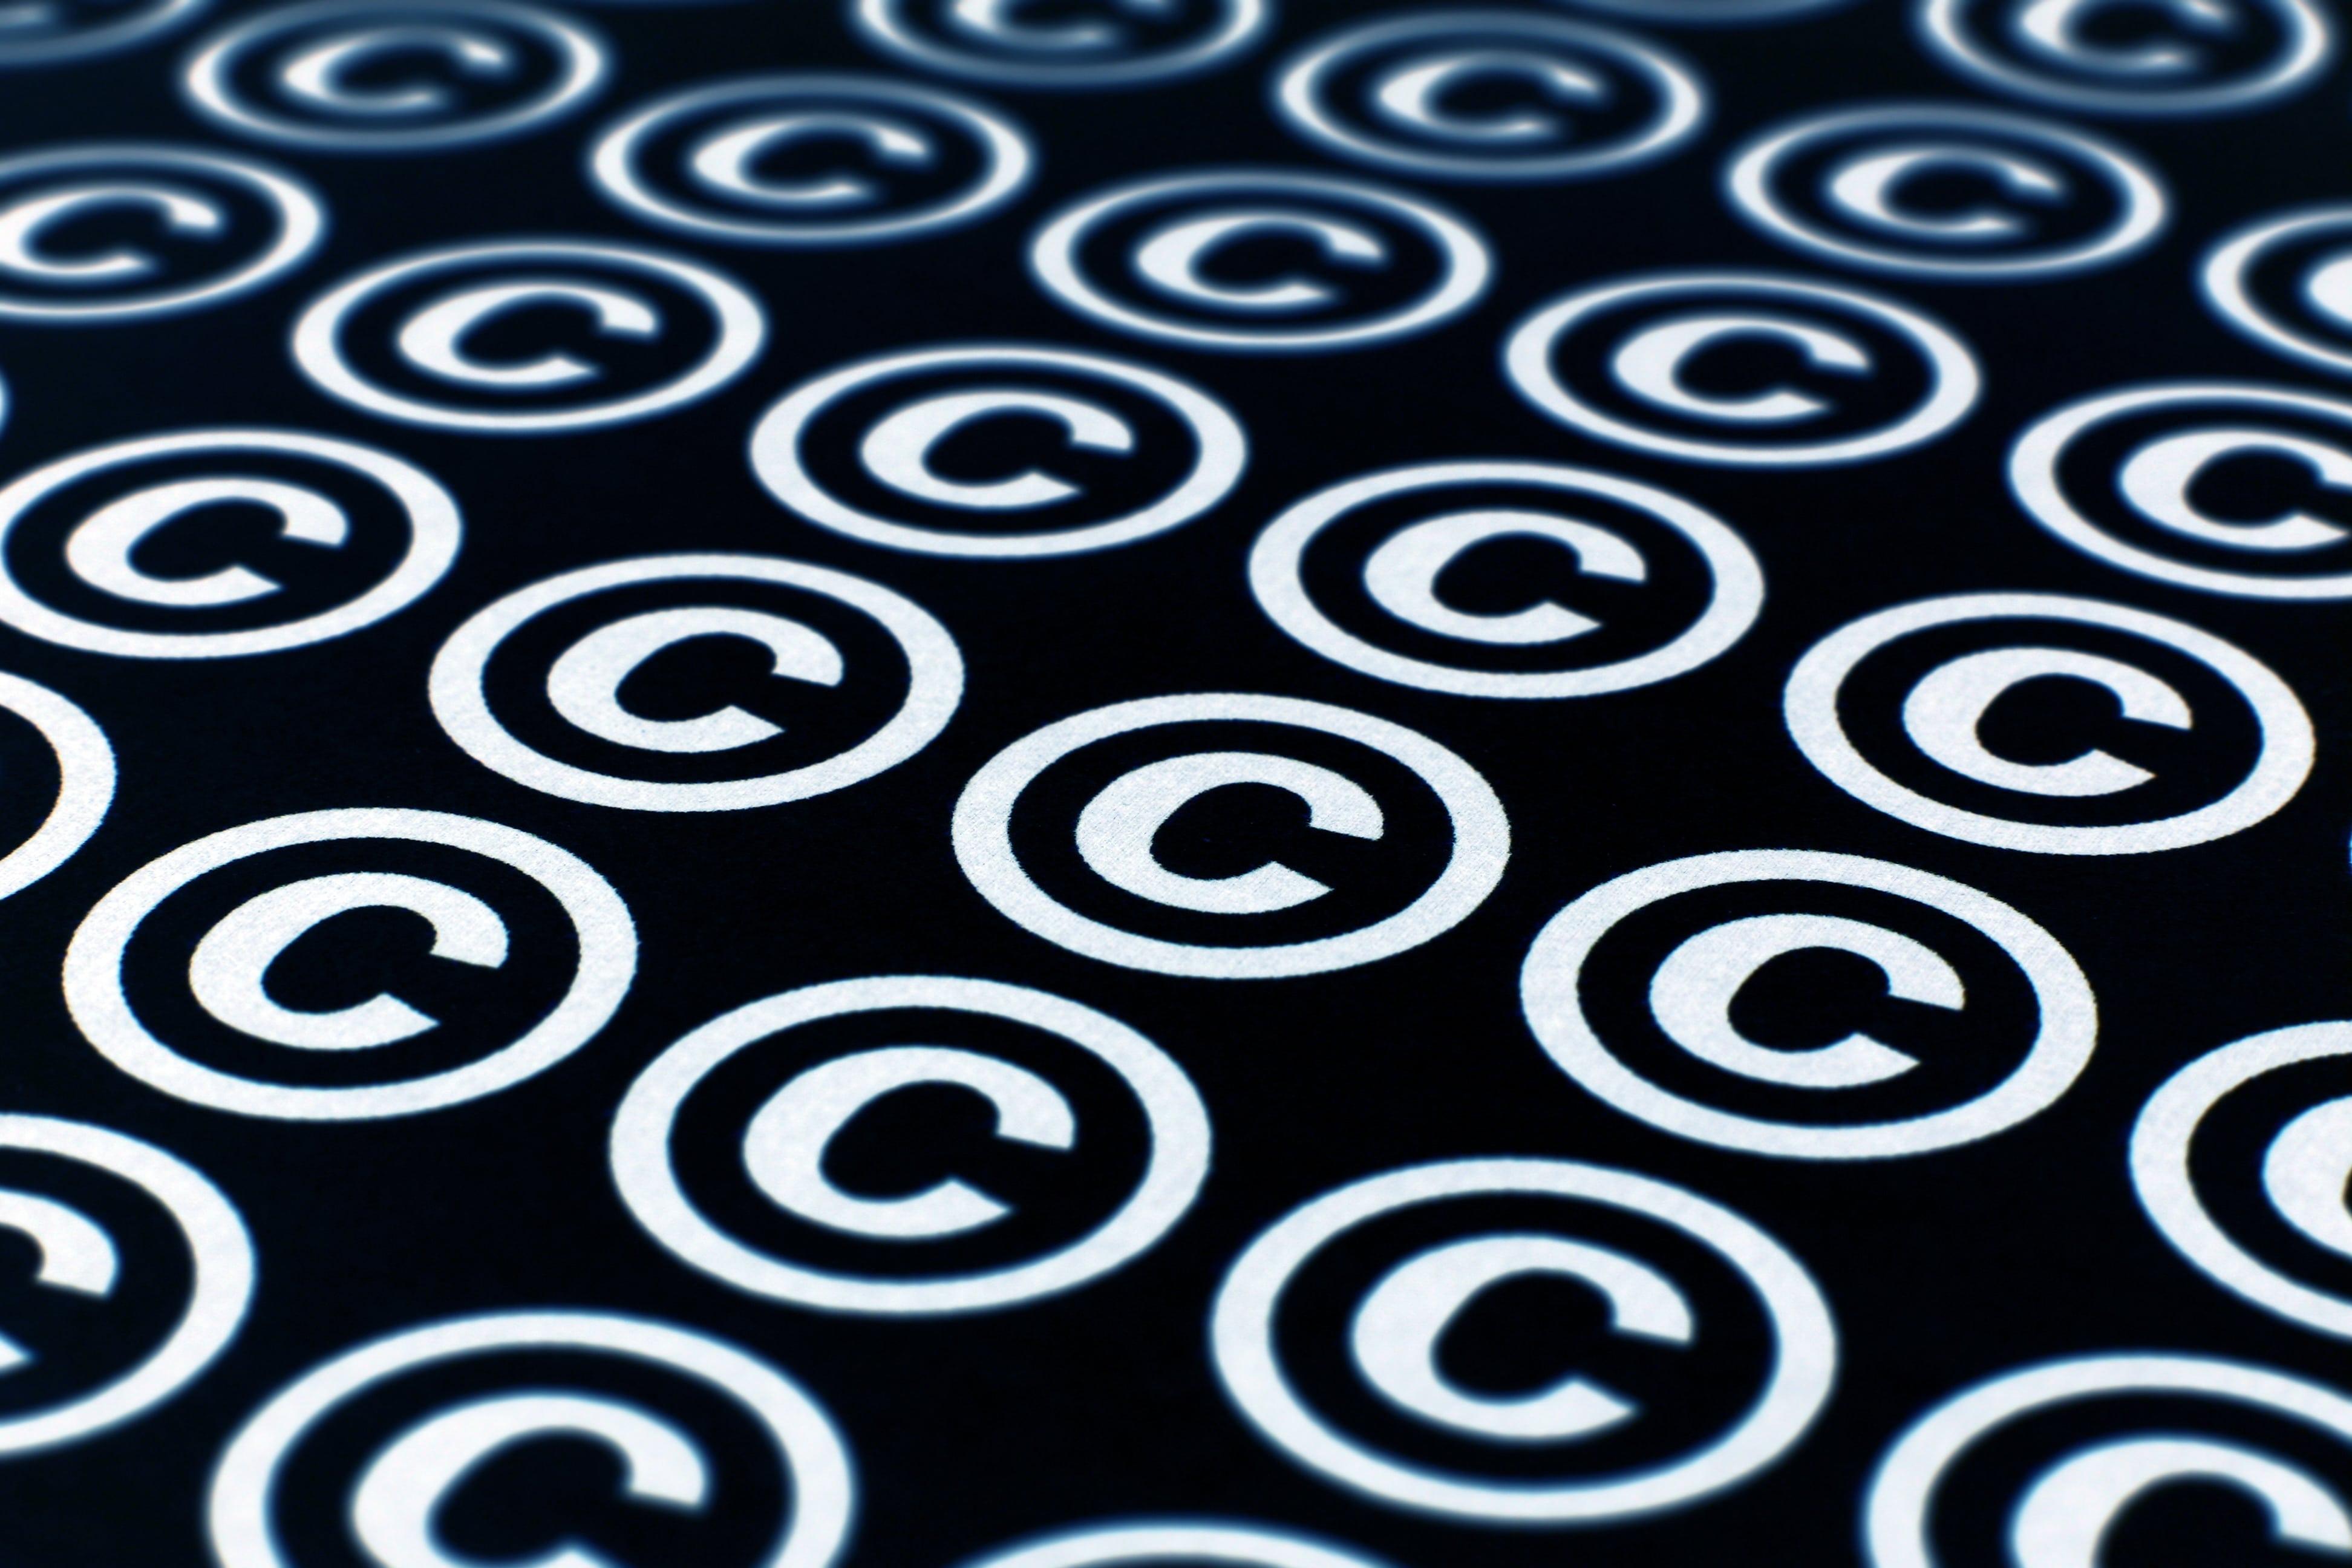 copyright symbol DMCA